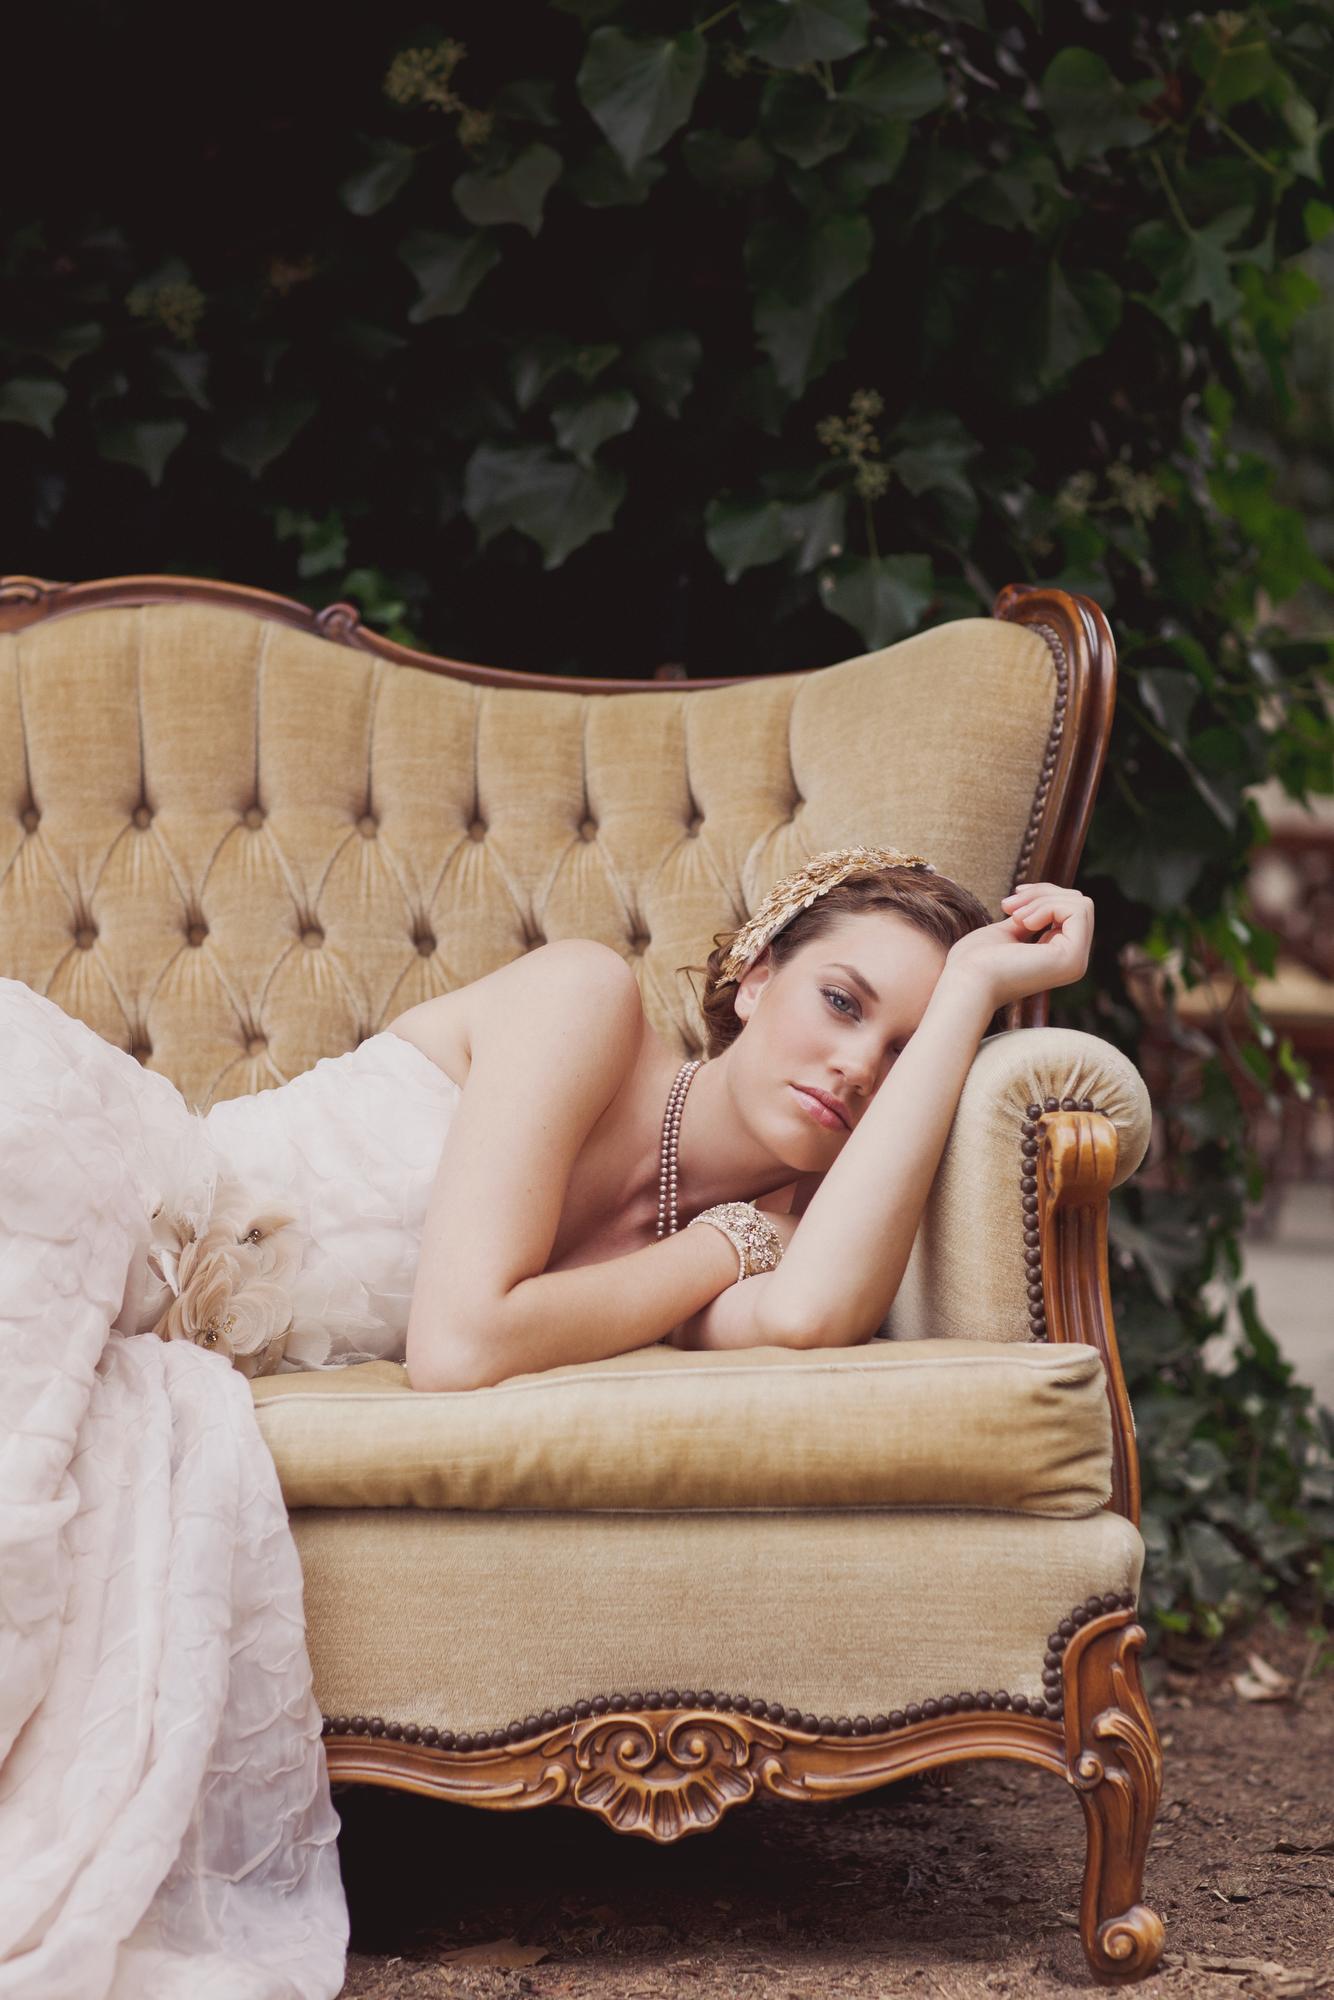 jennifer-skog-bridal-fashion-photographer-lifestyle-0012.jpg